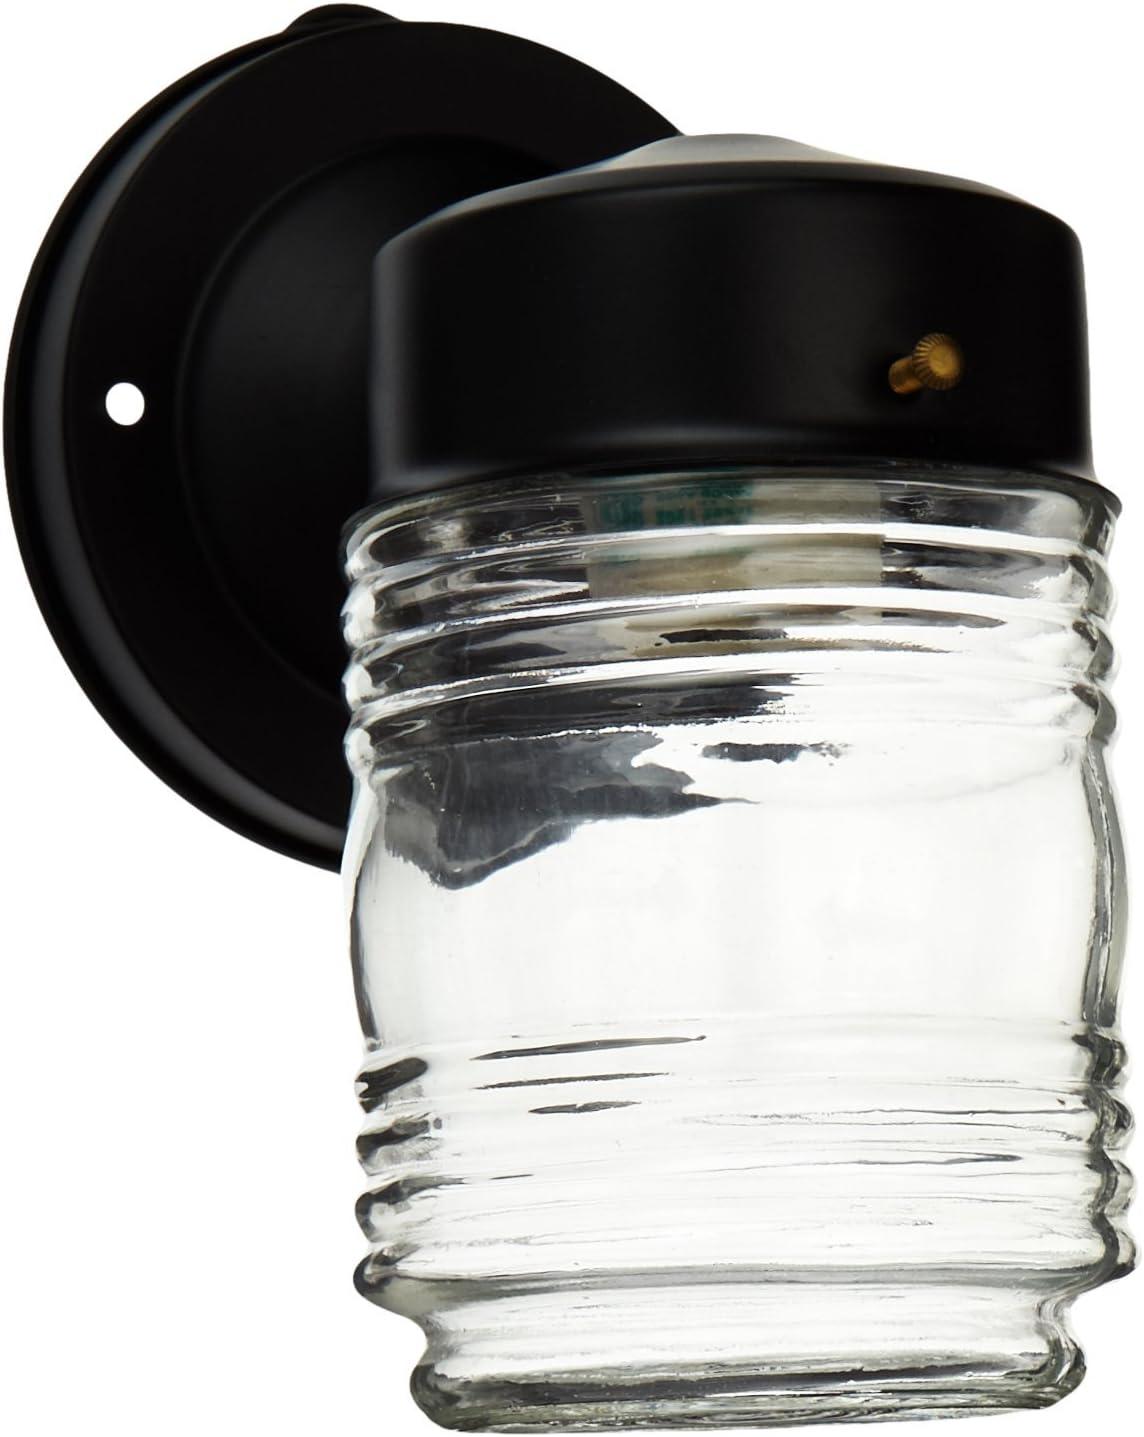 Budget Cast Max 84% OFF Aluminum Award-winning store Jelly Jar Light Outdoor Black in